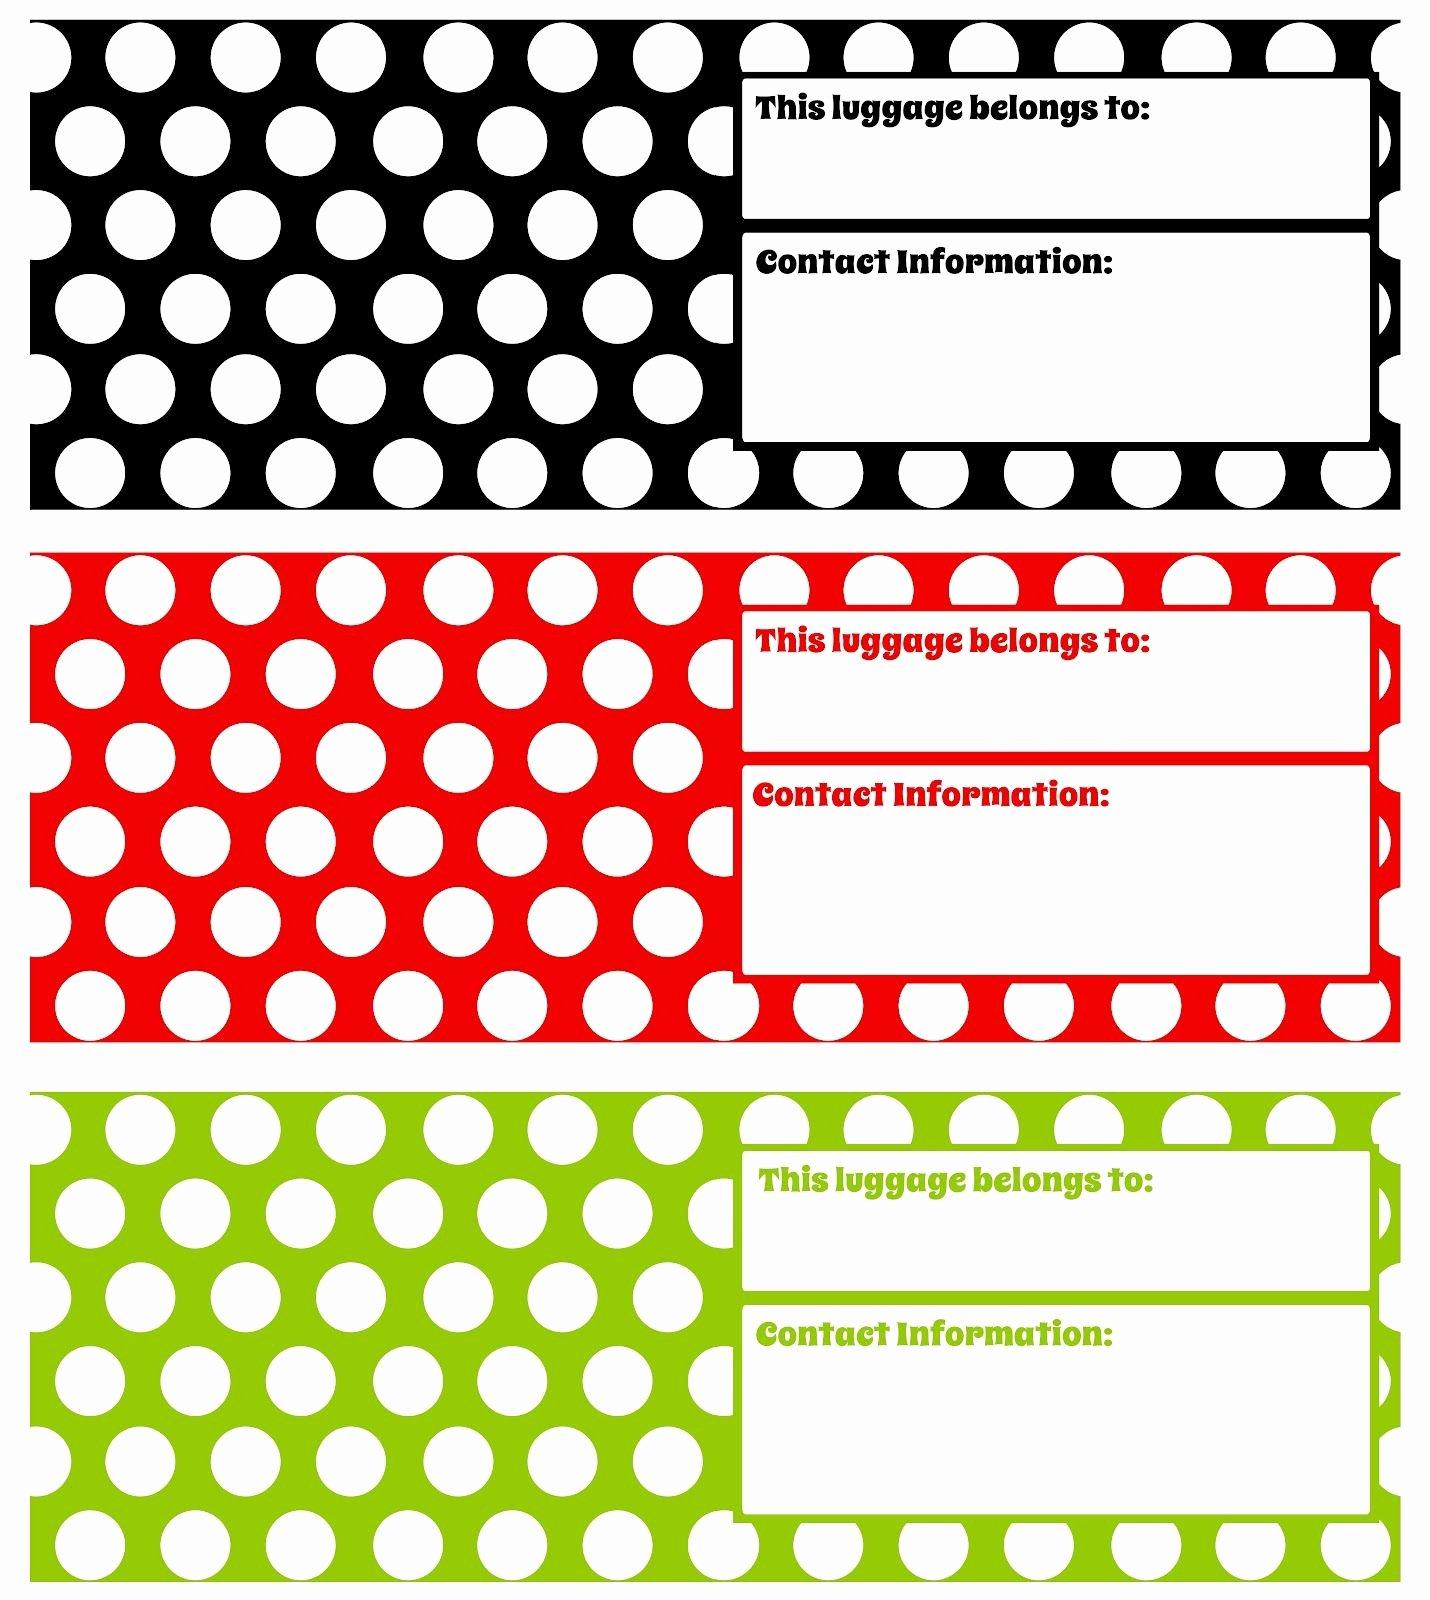 Diy Luggage Tags Template Inspirational Printable Luggage Tags Darling Doodles